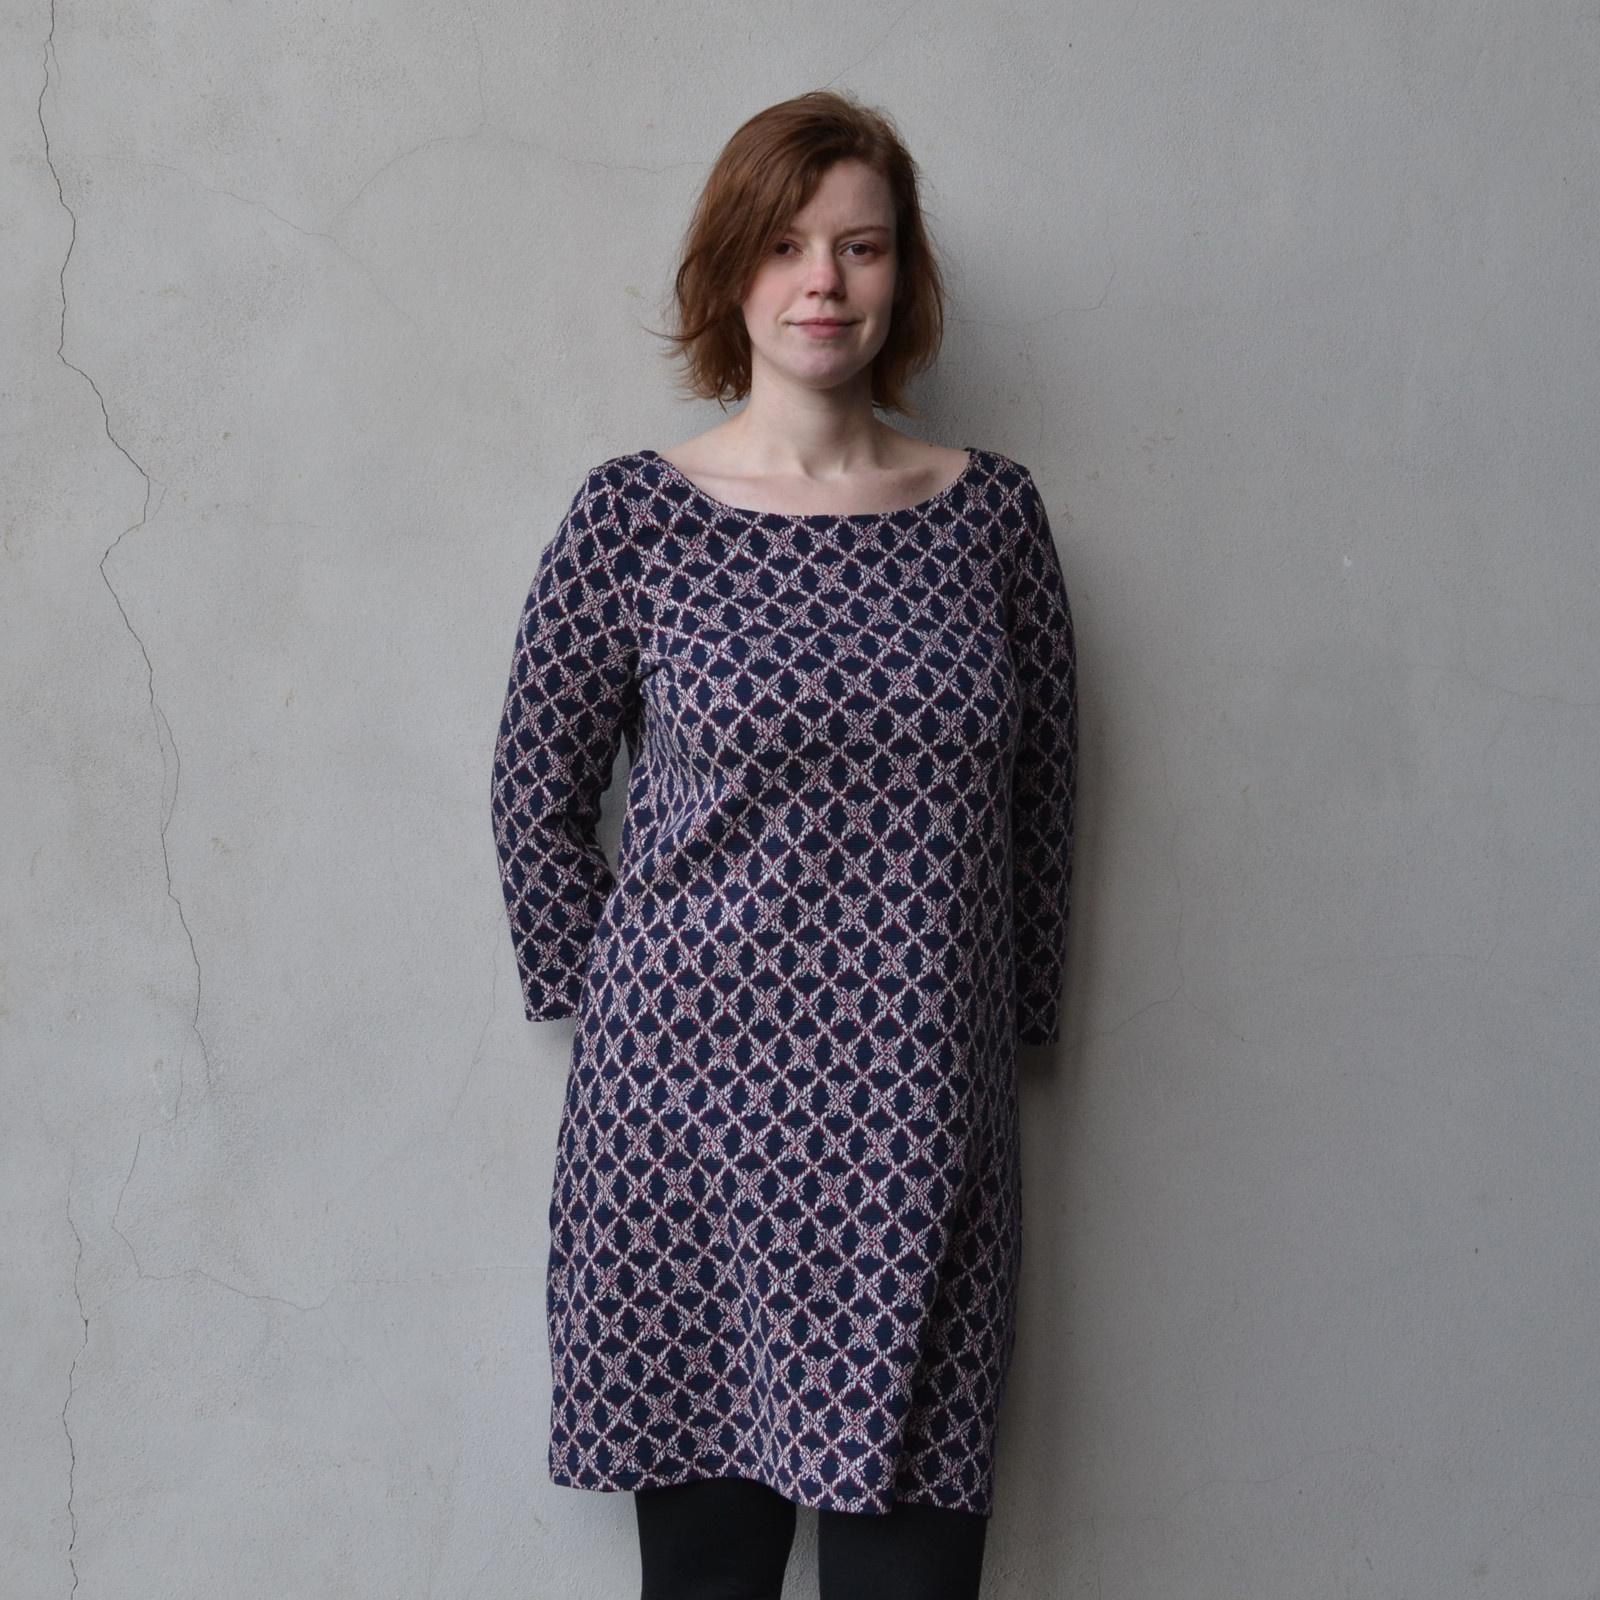 Teplé šaty se vzorkem 944562965d